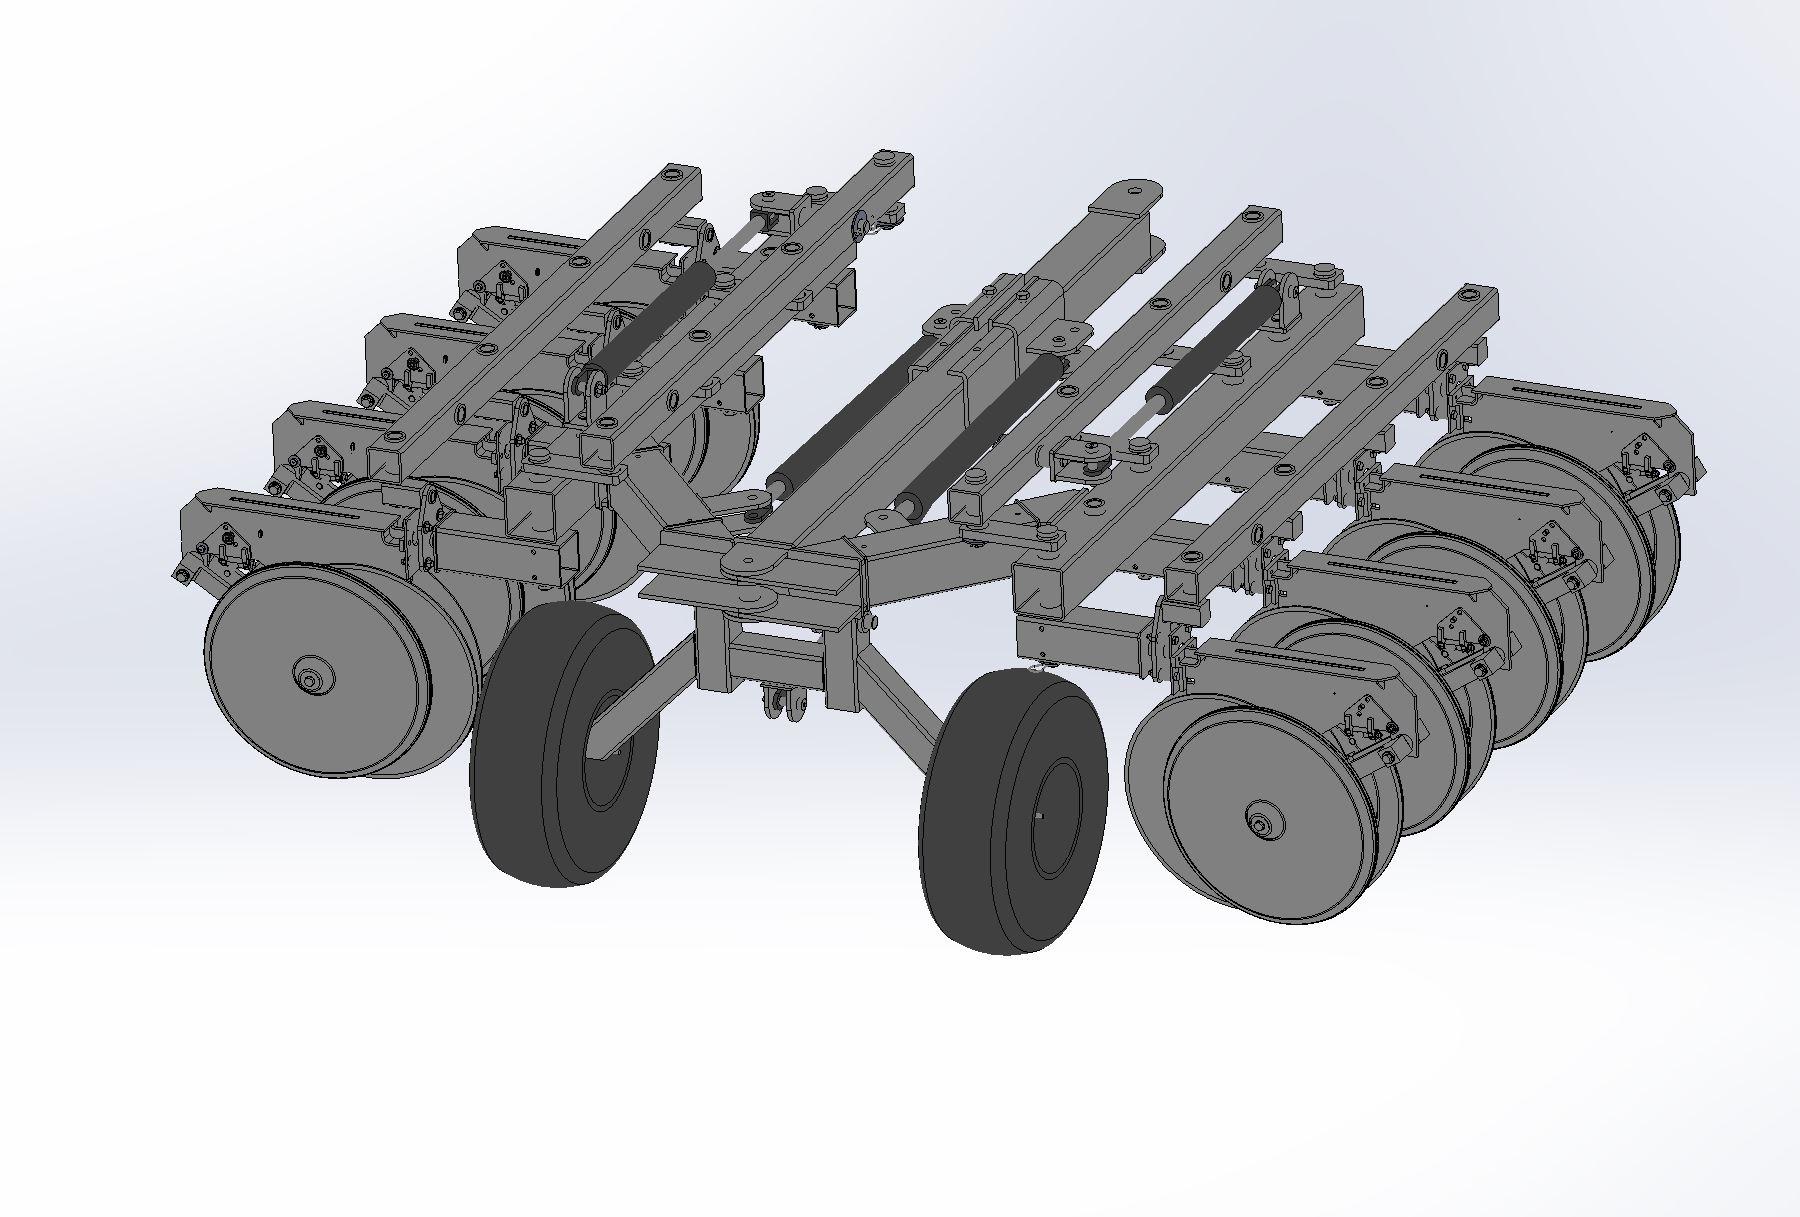 Folded into Transport Mode